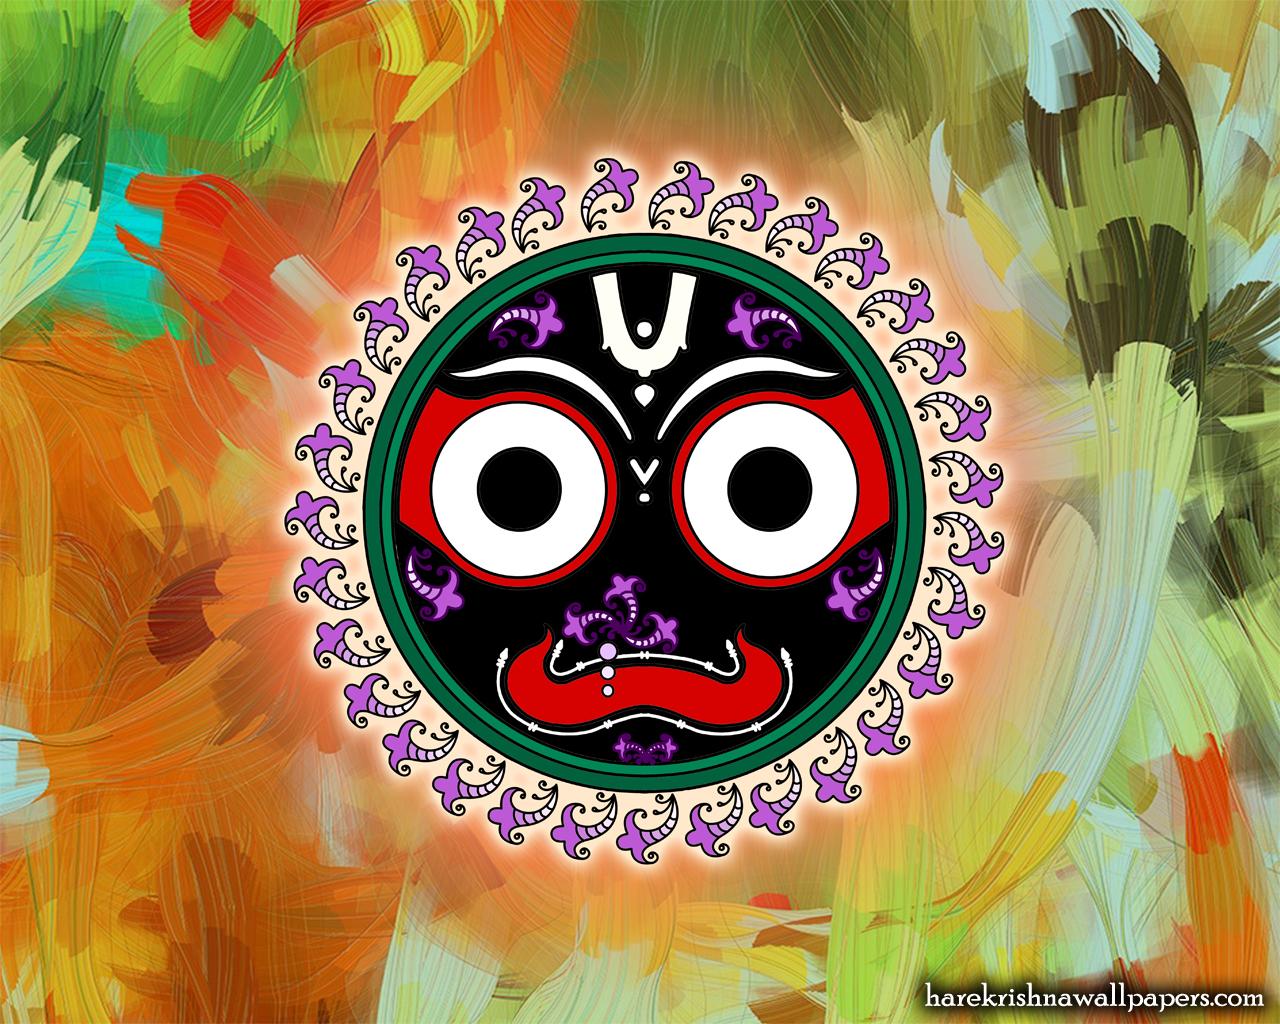 Jai Jagannath Wallpaper (017) Size 1280x1024 Download